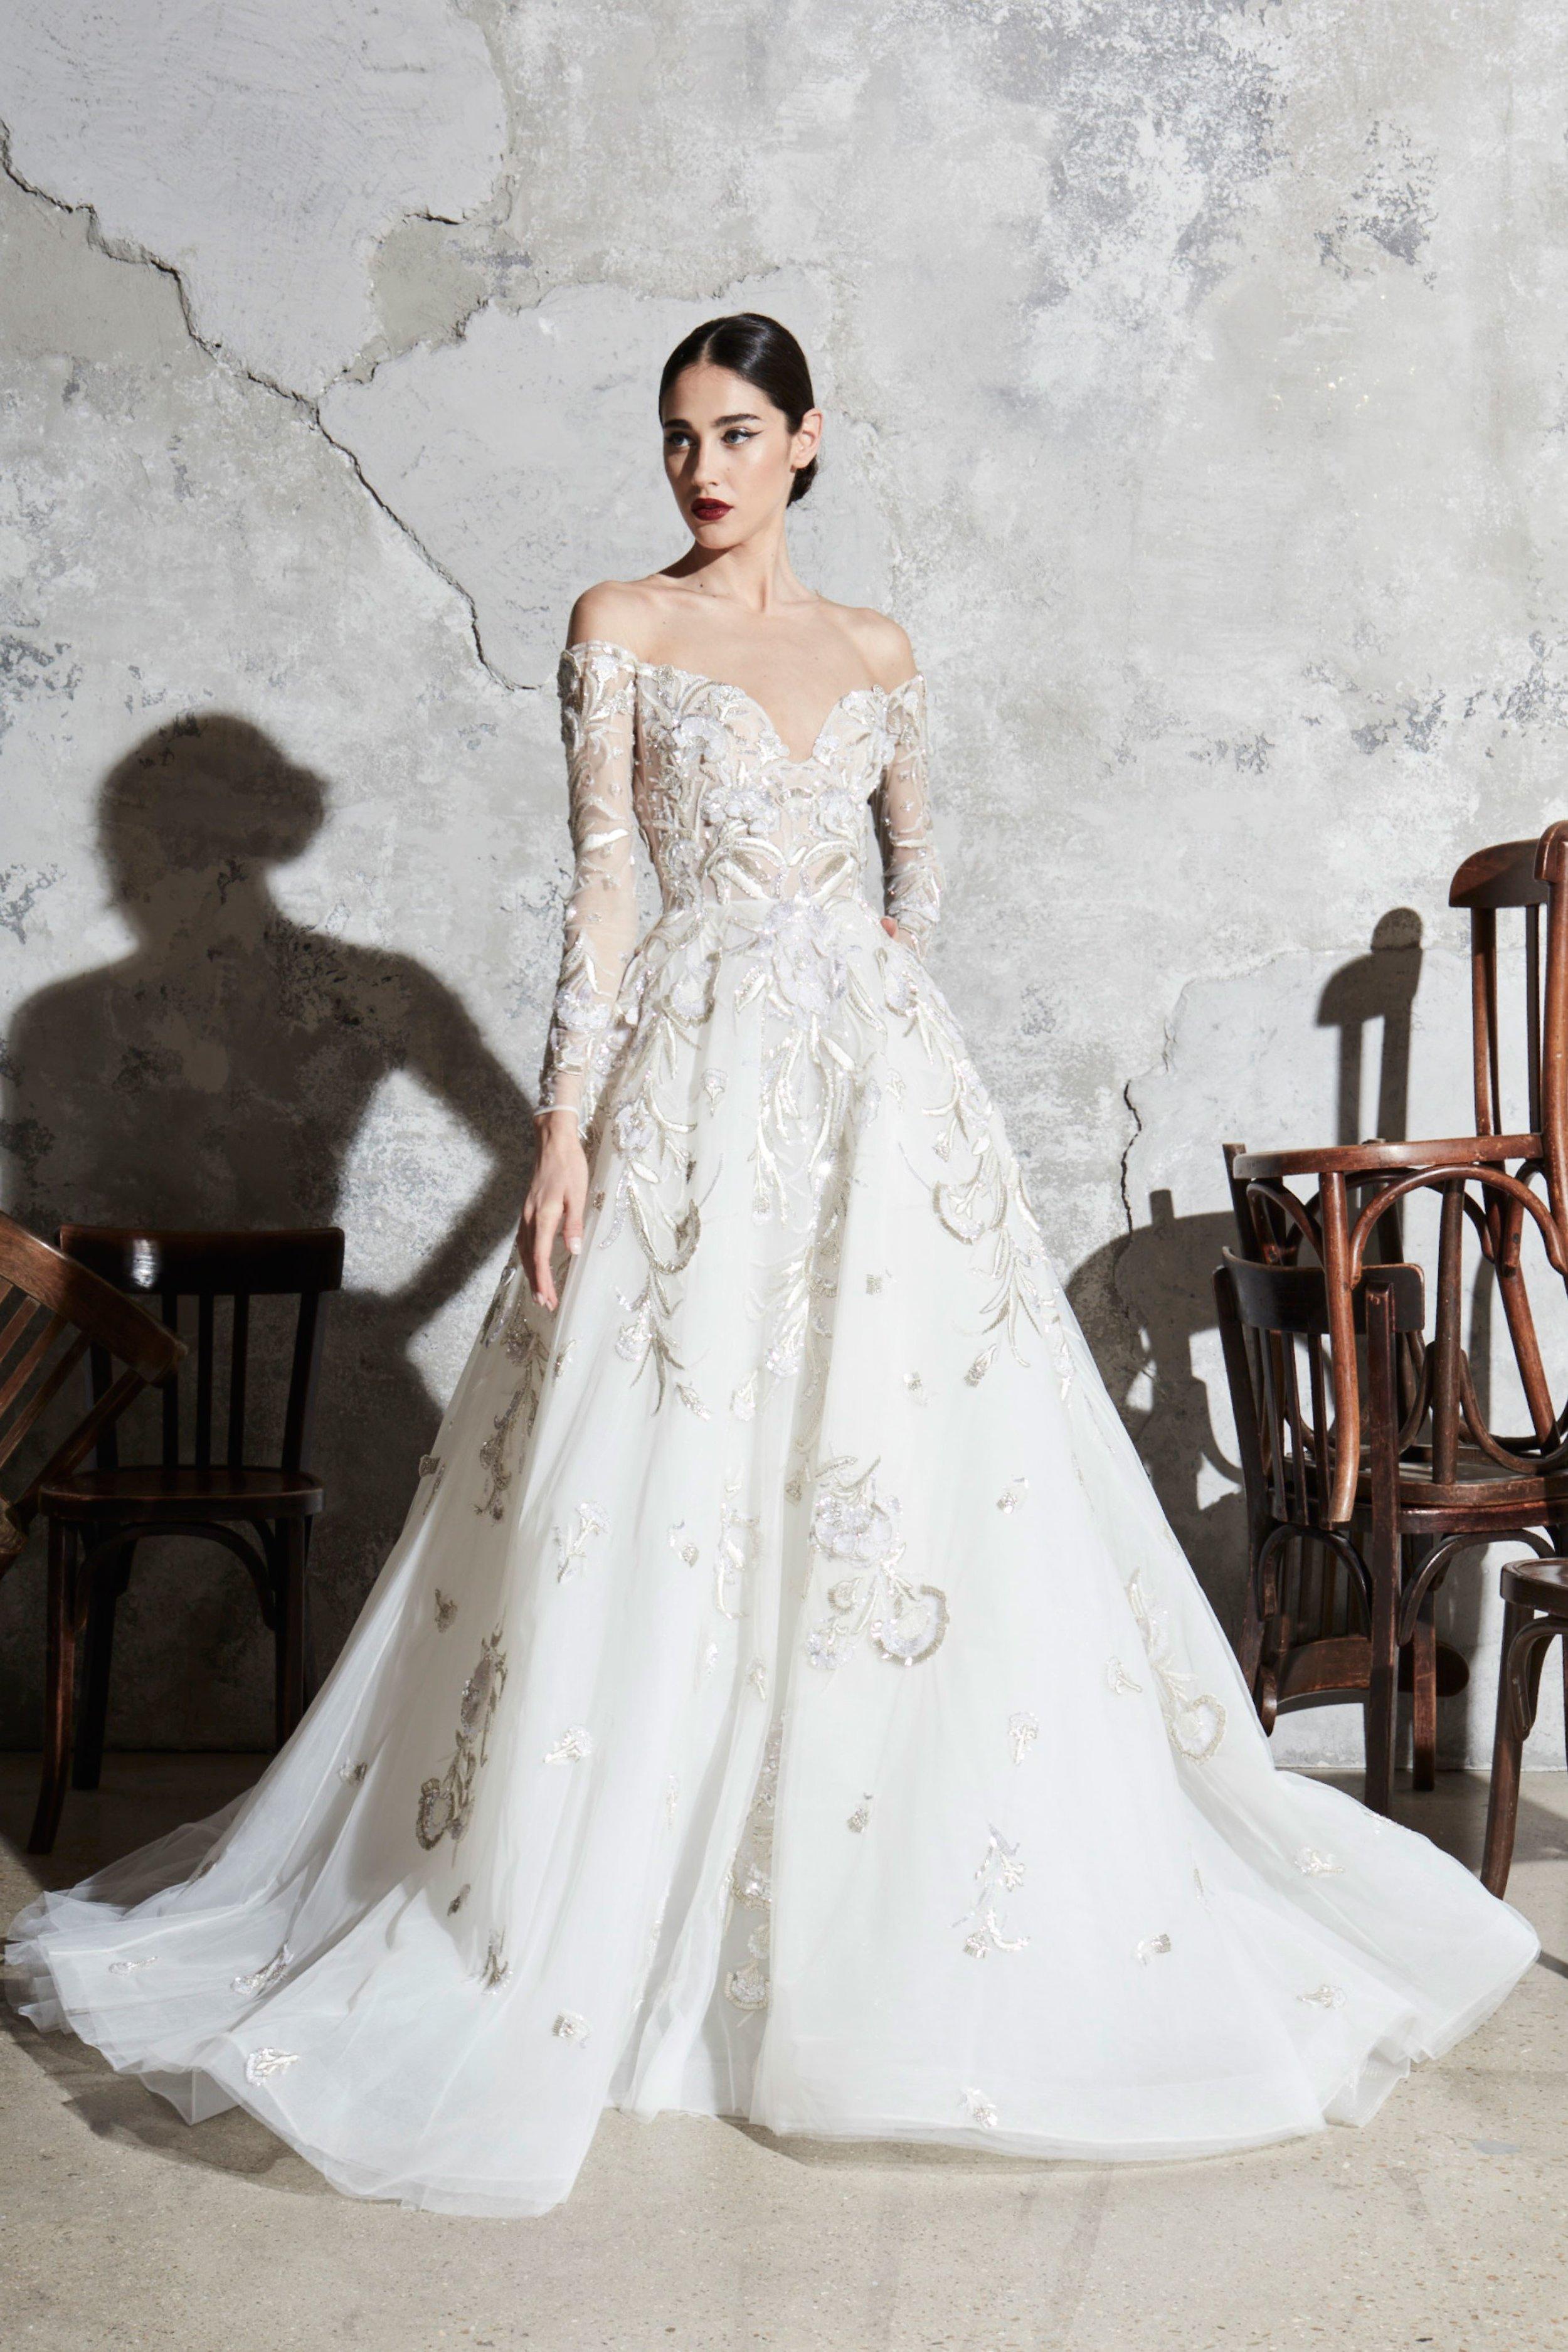 00024-zuhair-murad-new-york-bridal-Spring-2020-CREDIT-Thomas-Nutzl.jpg